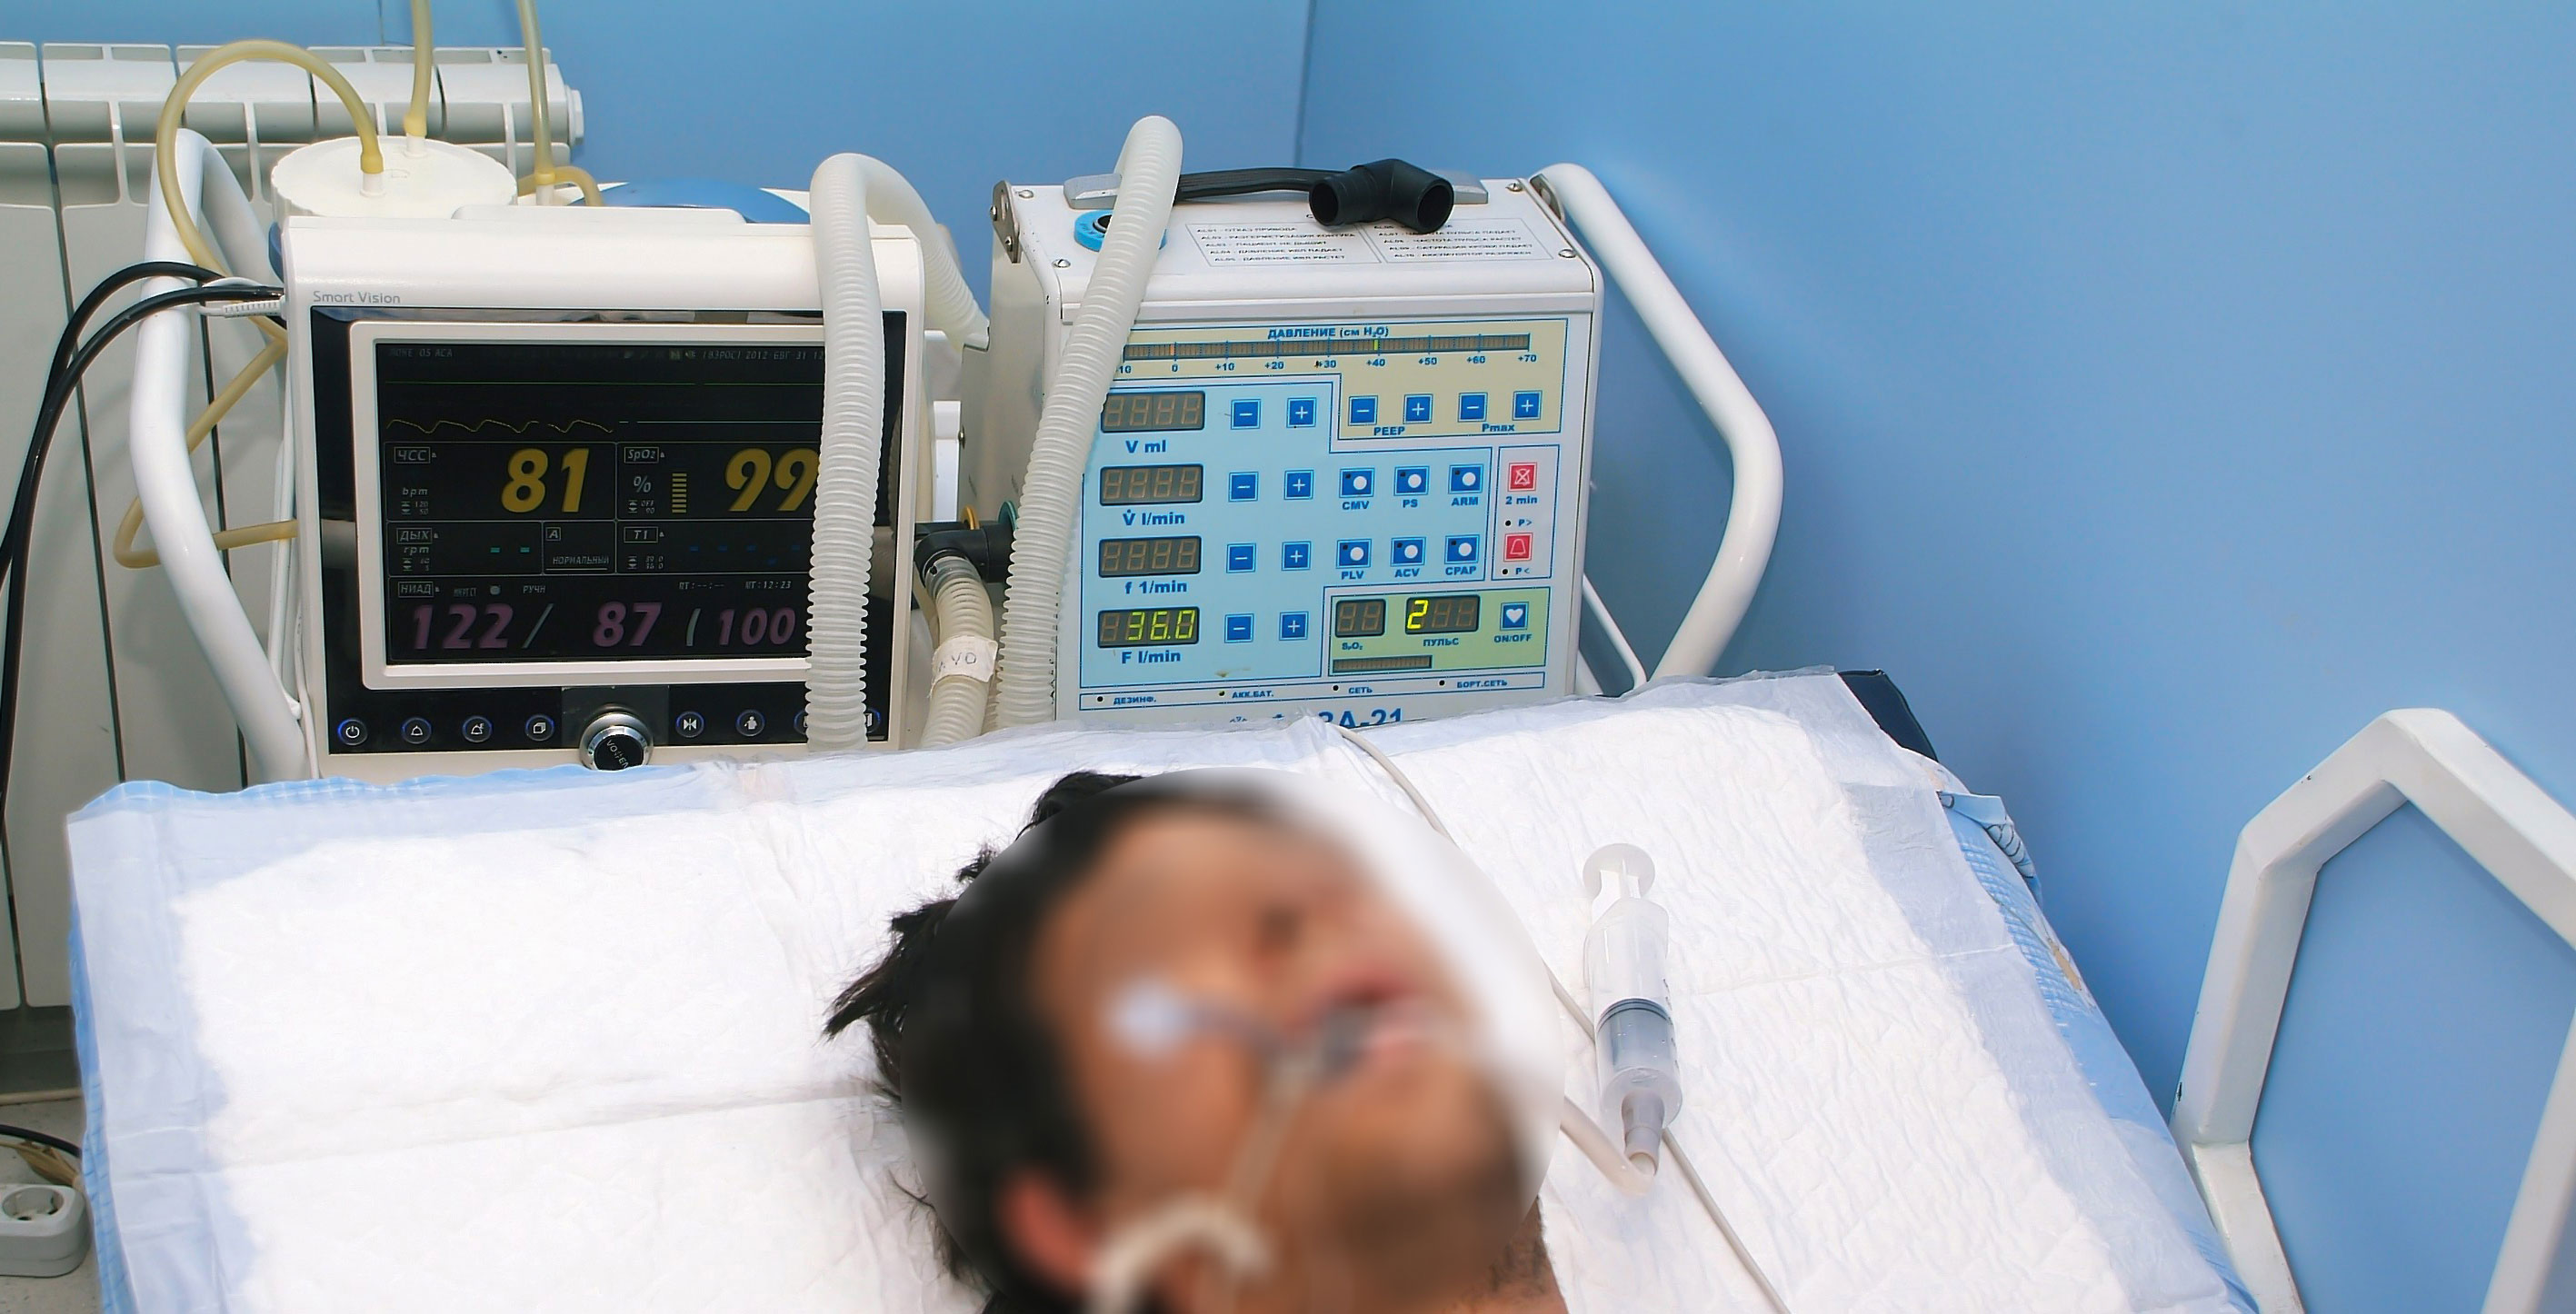 alcohol-treatment-center-equipment.jpg